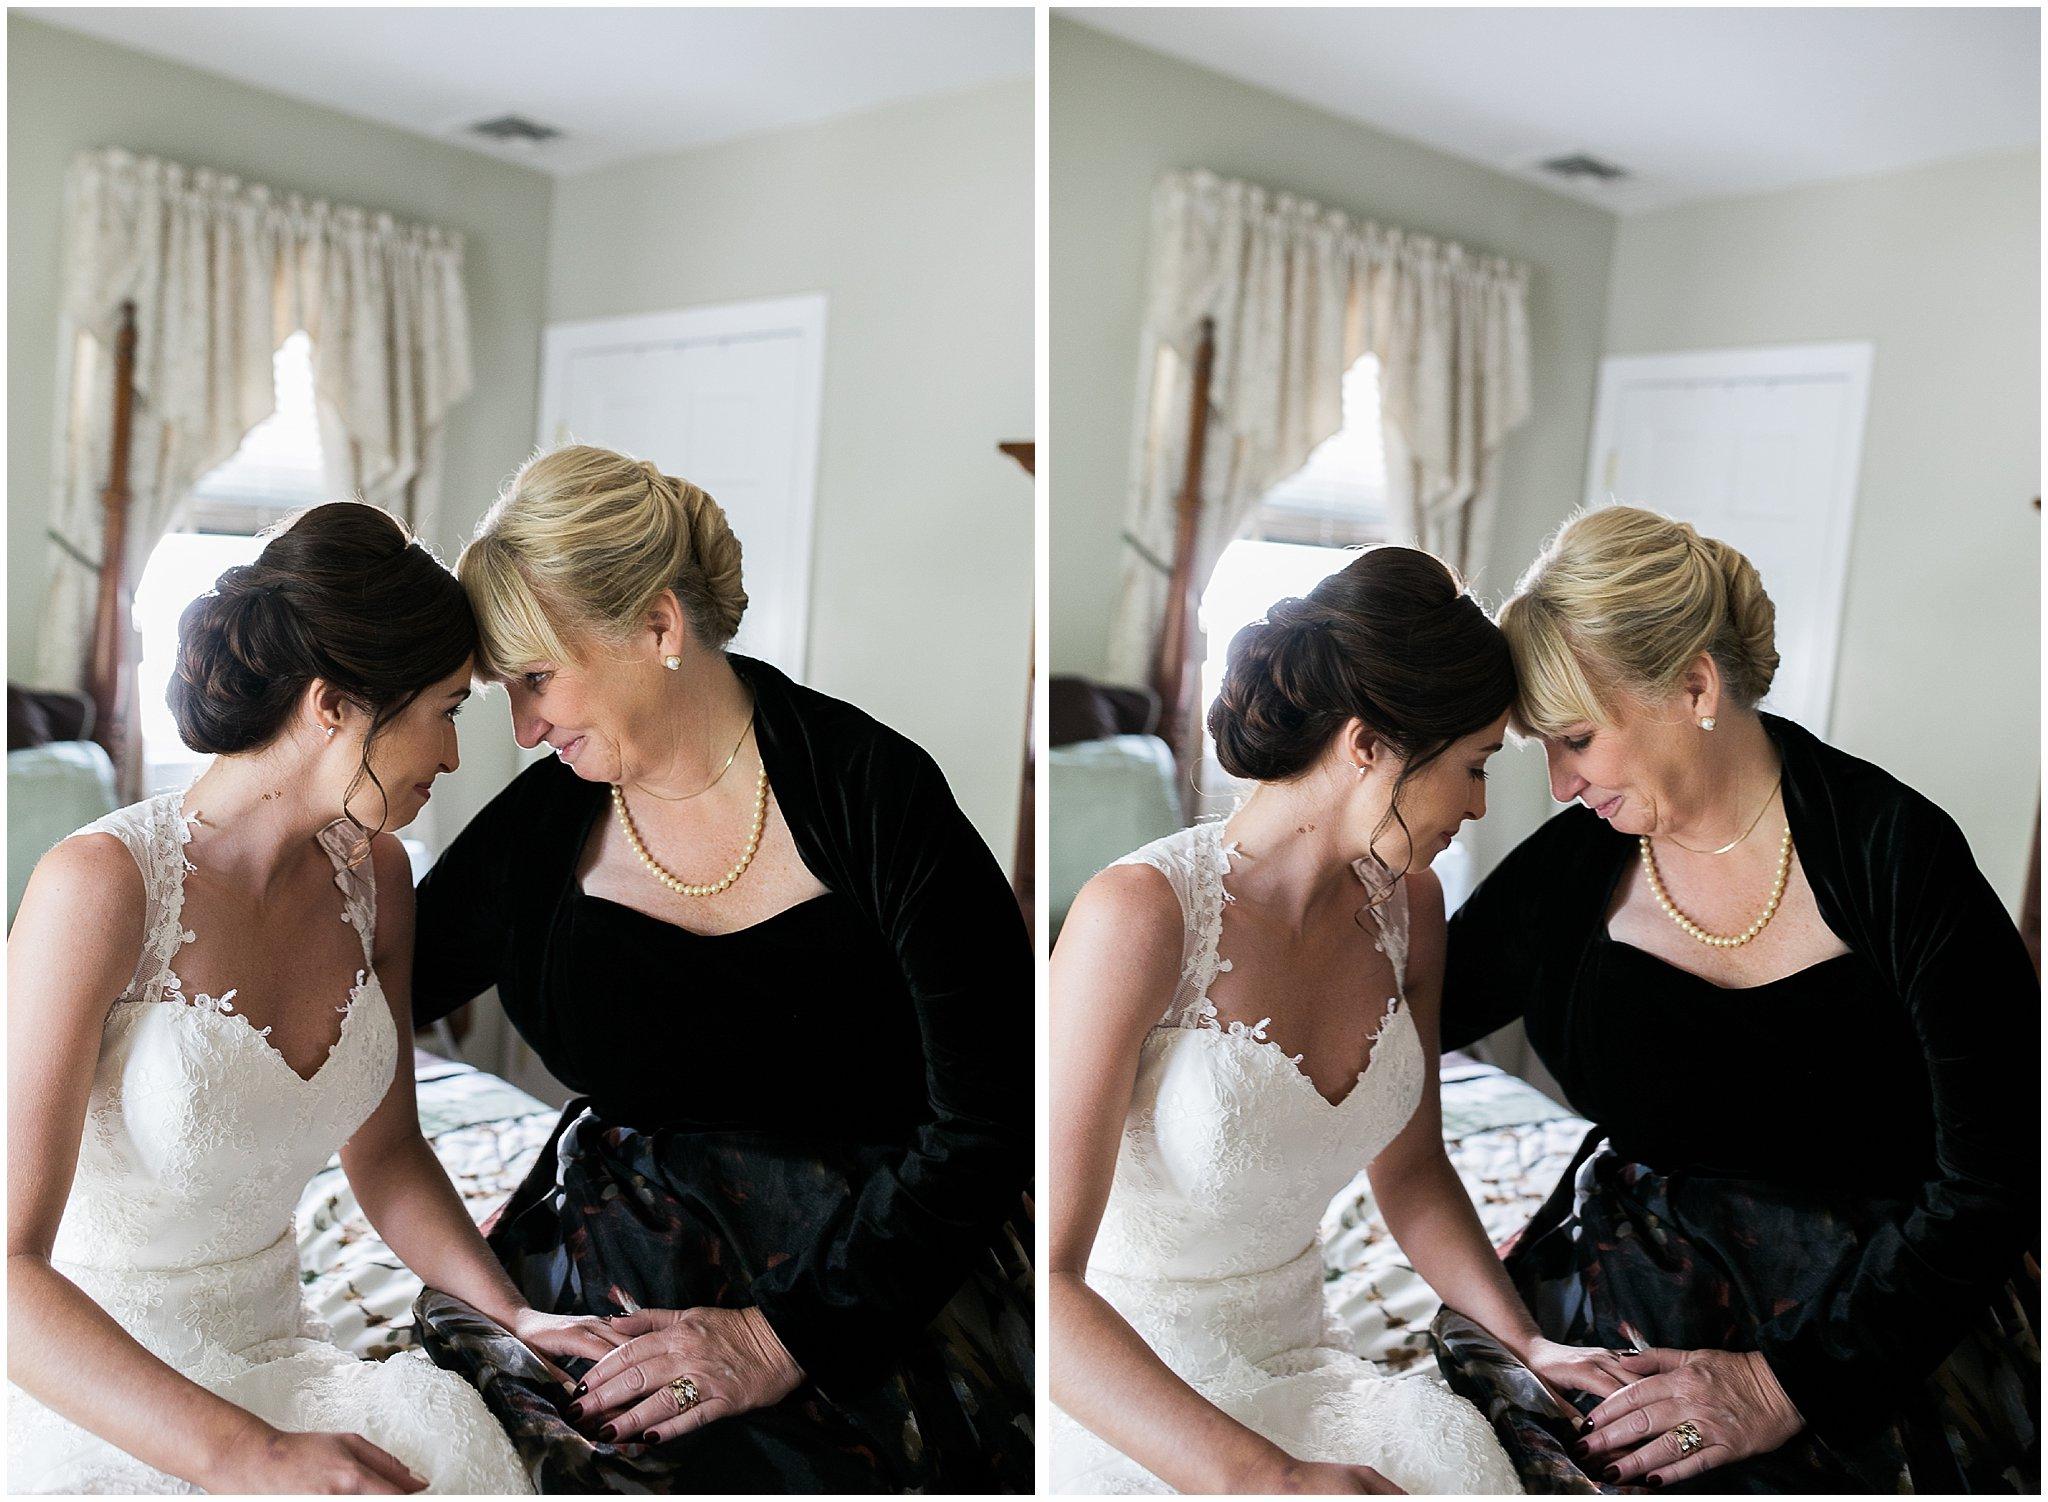 Seaport Hotel Wedding Boston Photographer Sweet Alice16.jpg